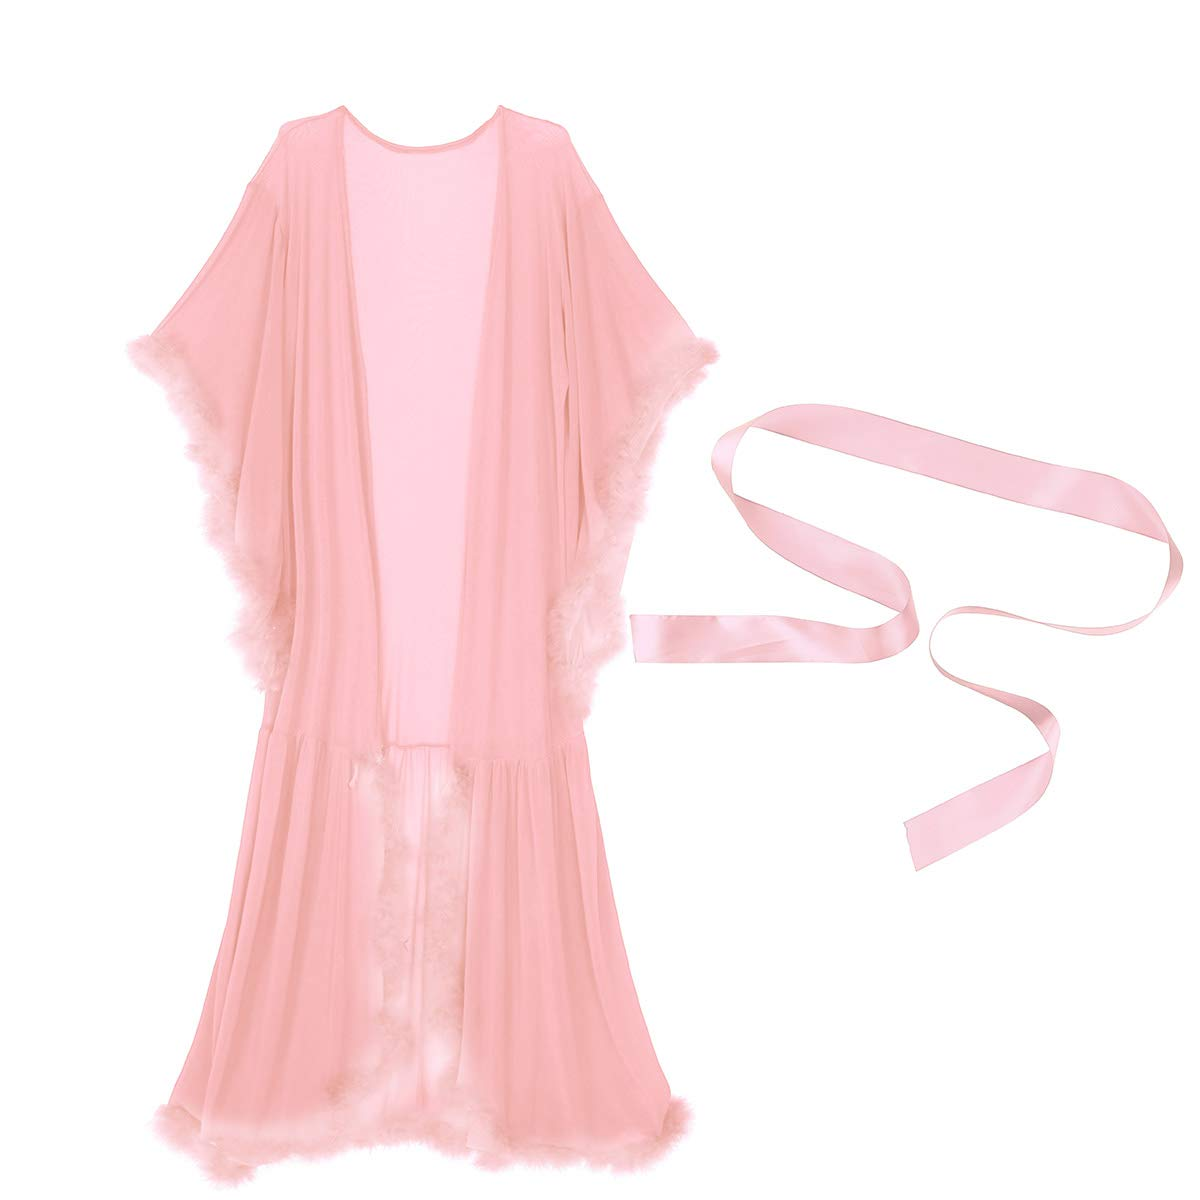 Amazon.com: TiaoBug Womens Sexy Sheer Long Lingerie Feather Robe Nightgown Bathrobe Pajamas Sleepwear Coral Pink One Size: Clothing